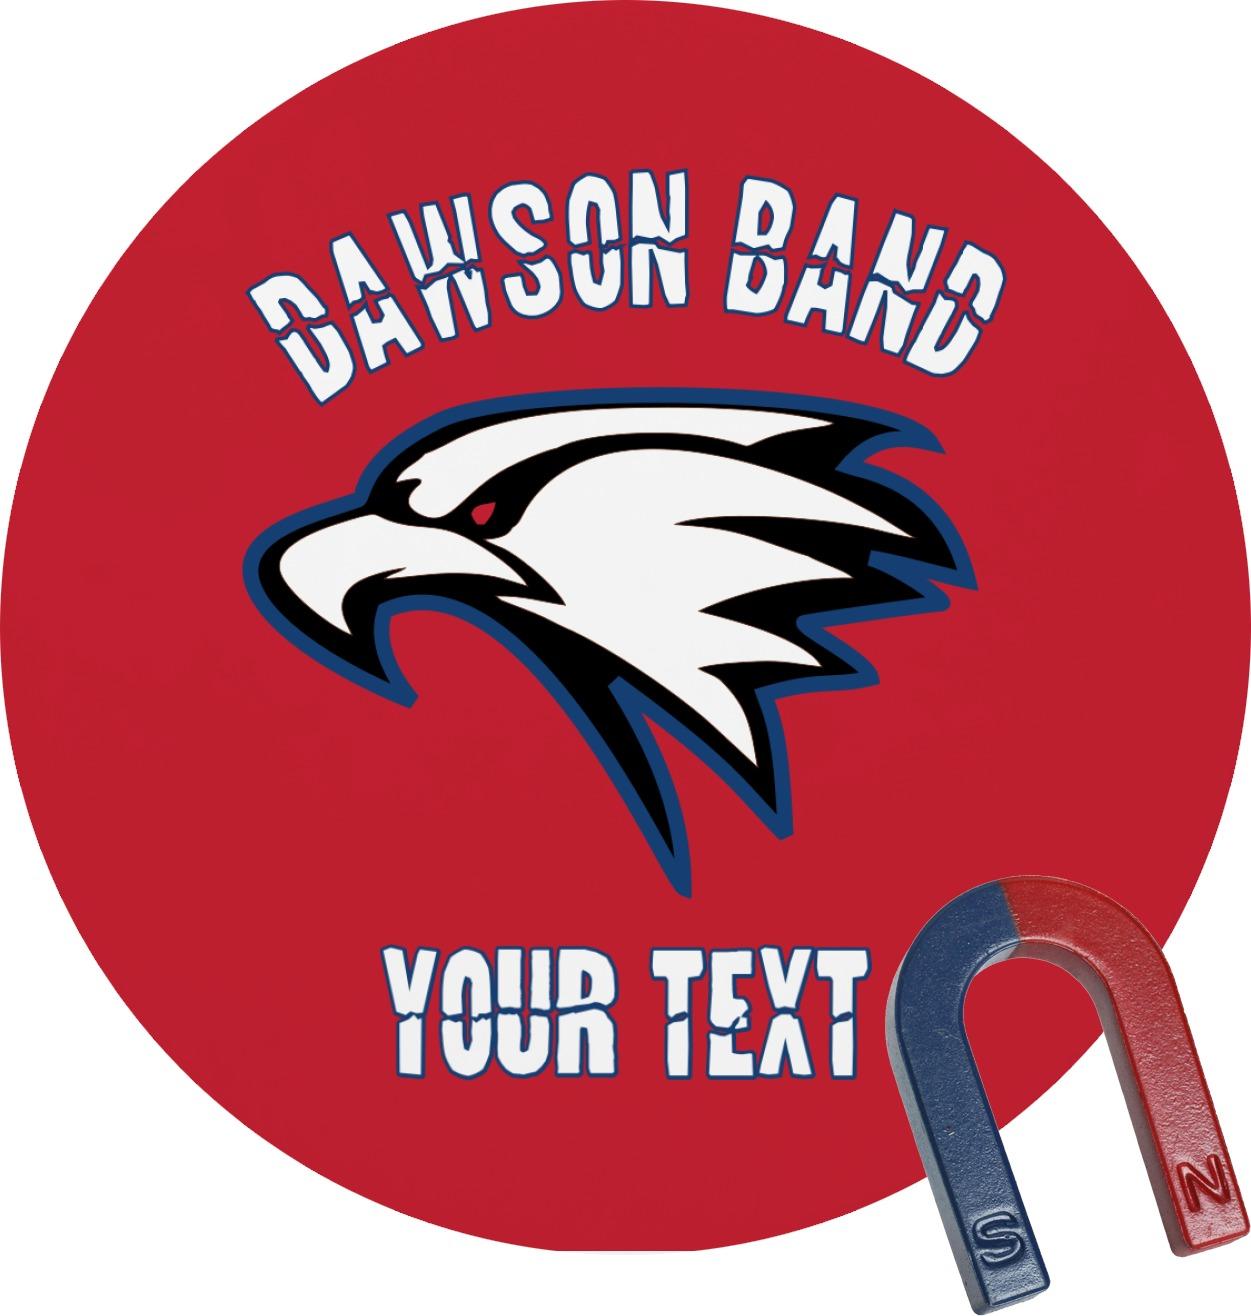 Dawson eagles band logo round magnet personalized